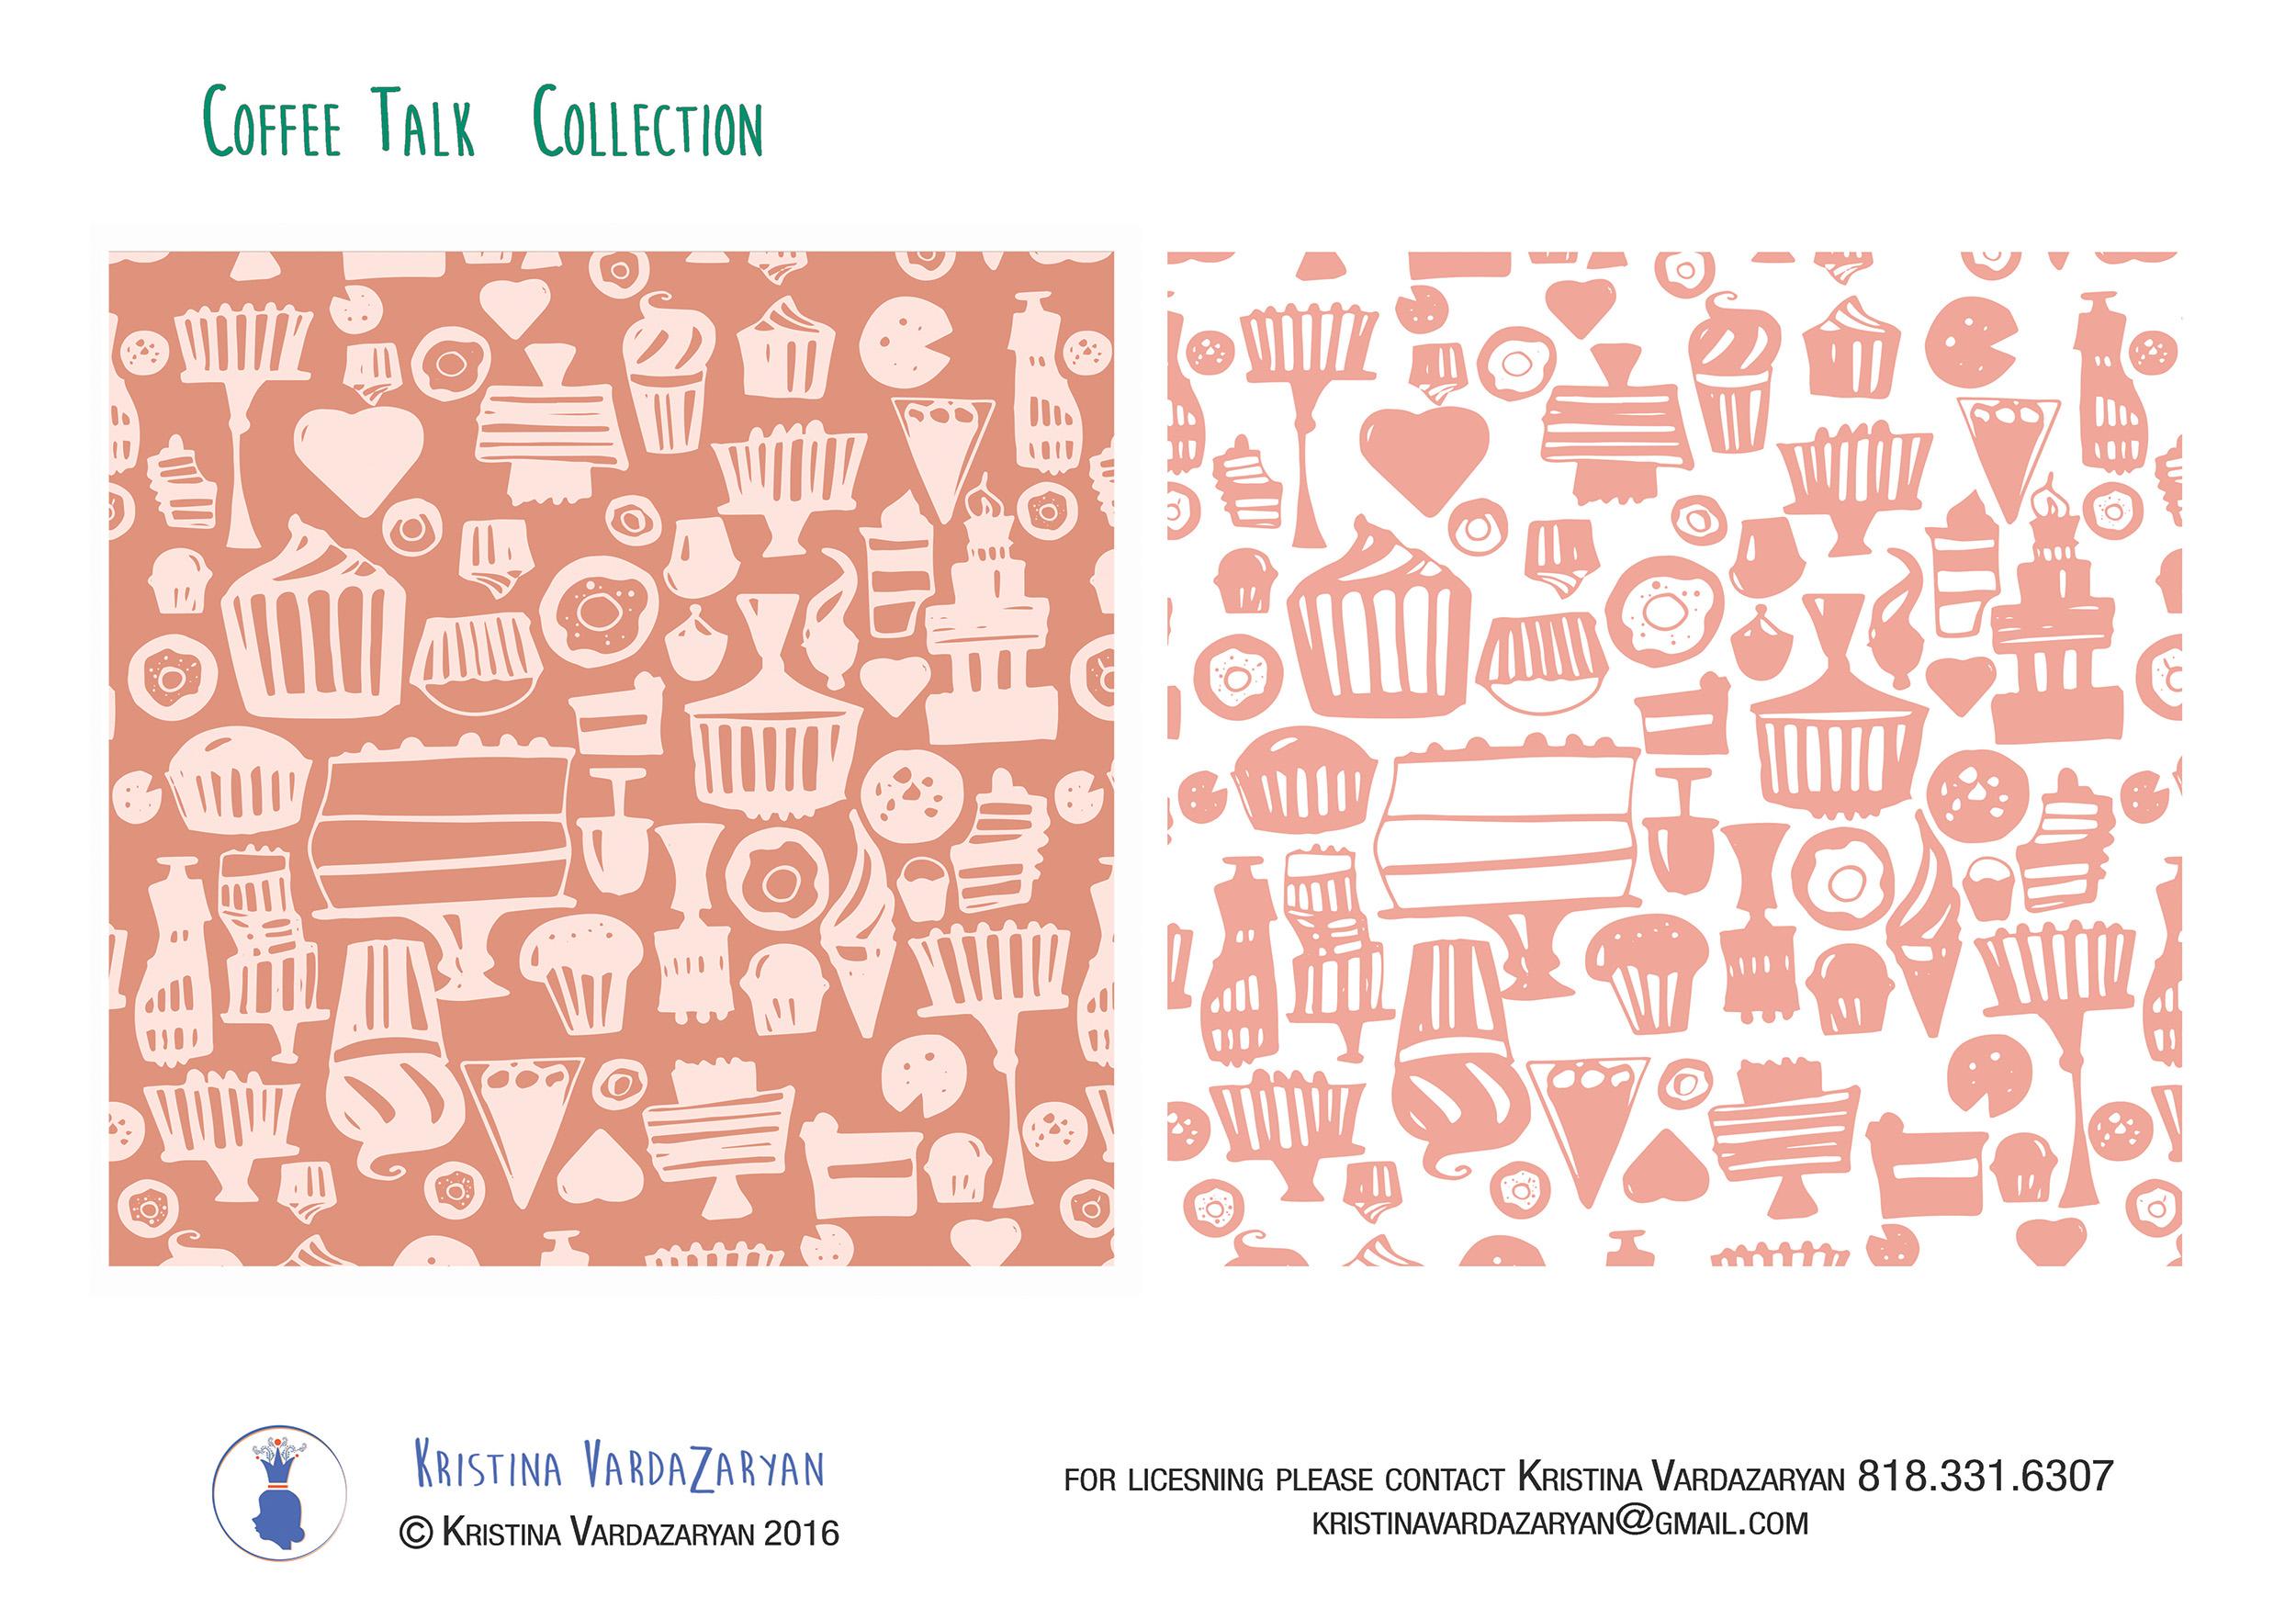 CoffeeTalkCollection_KristinaVardazaryan7